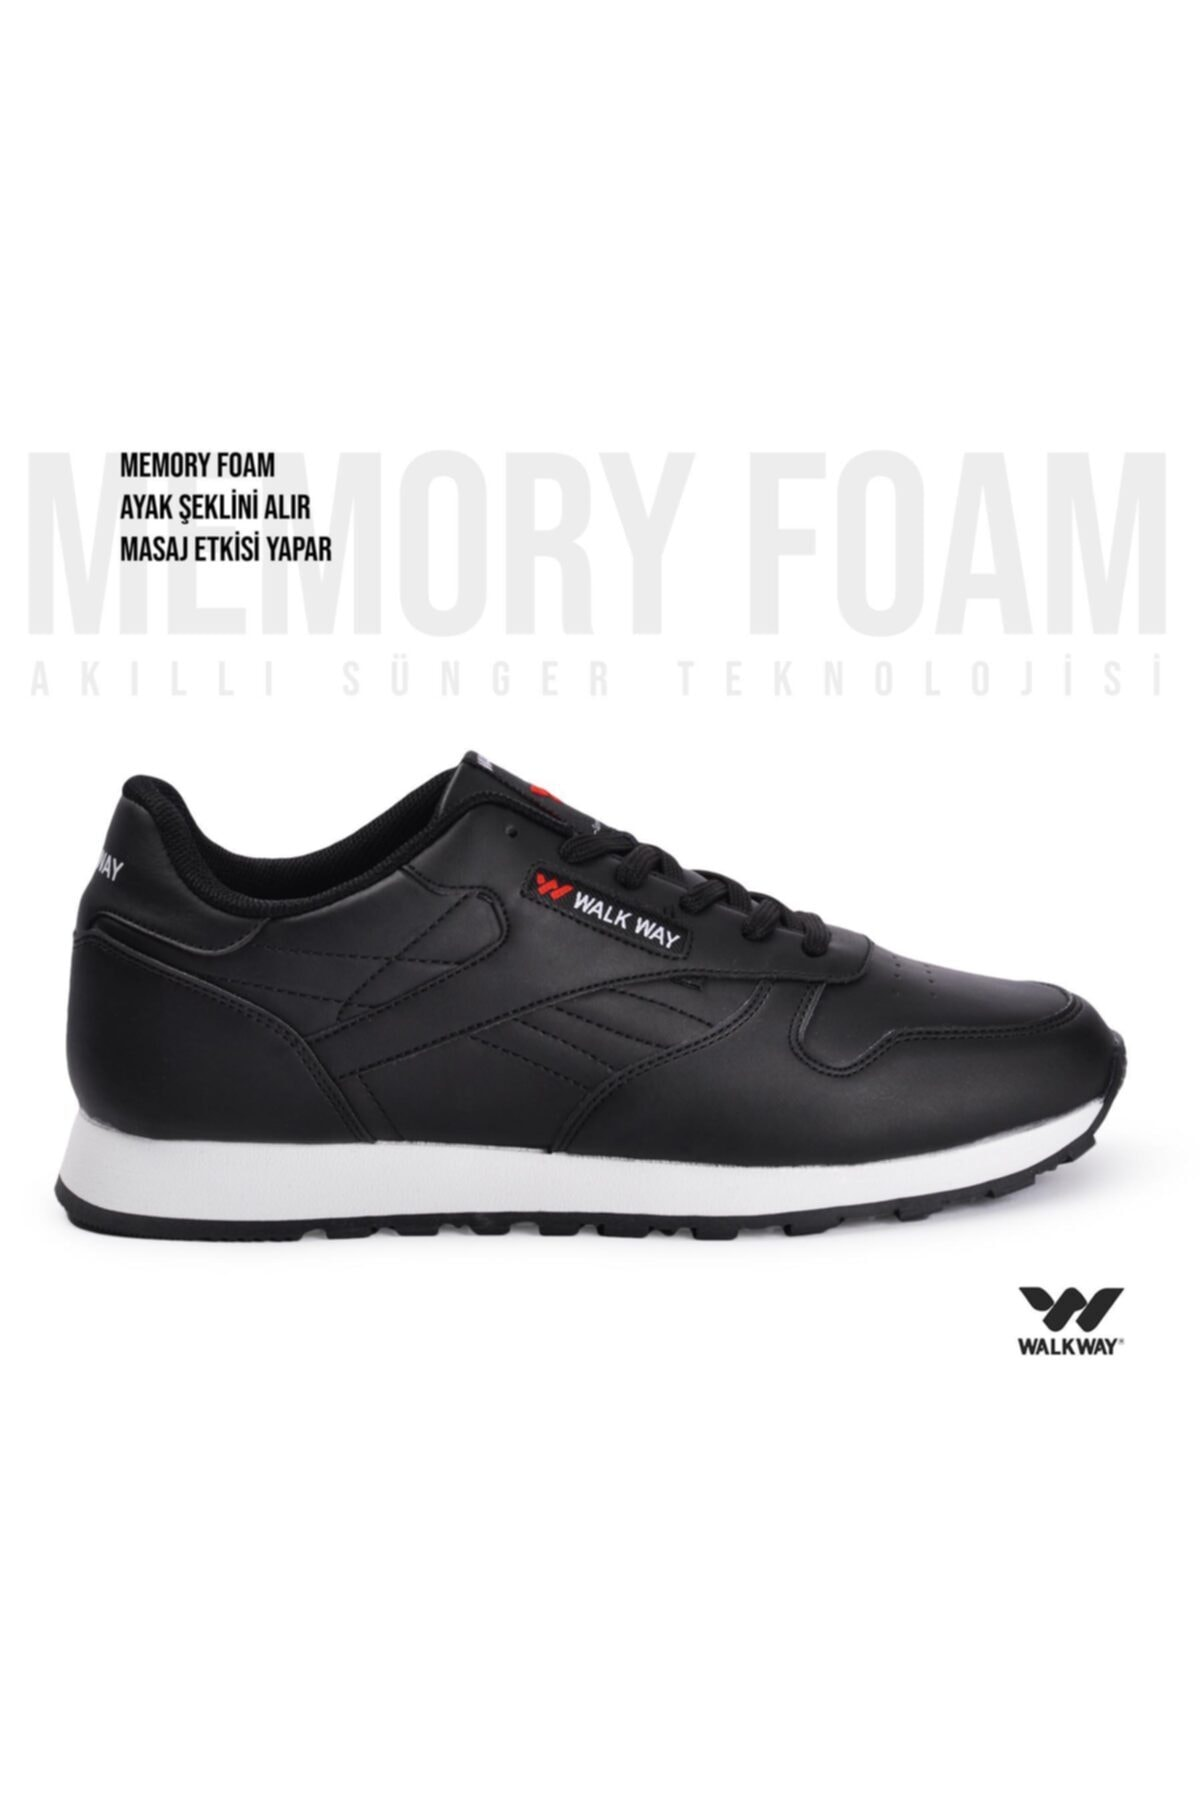 WALKWAY Memory Foam Siyah Beyaz Erkek Spor Ayakkabı Wlk23602 2